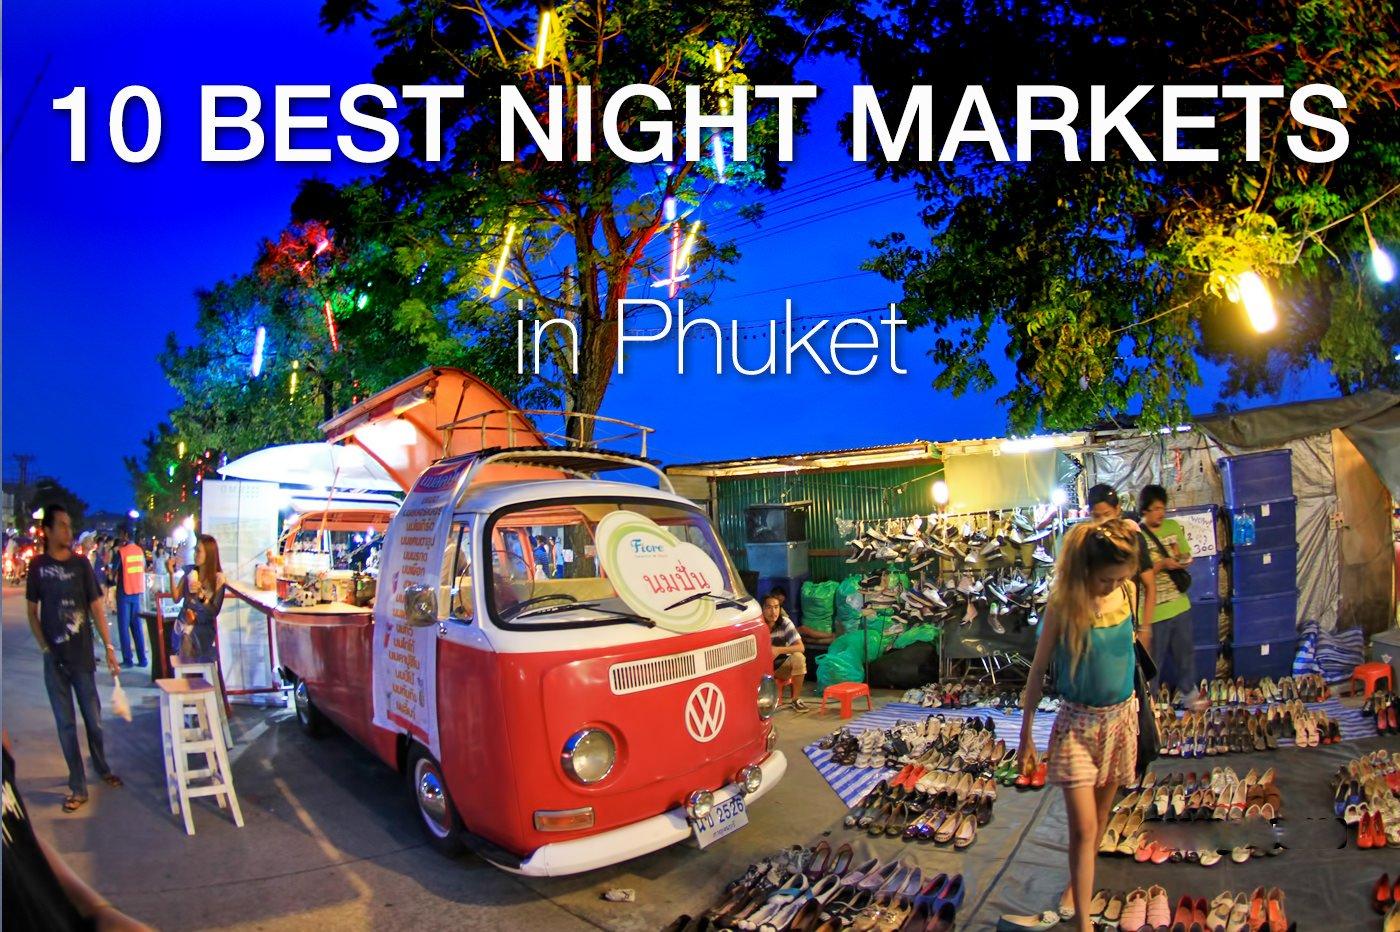 5 Best Night Markets in Phuket